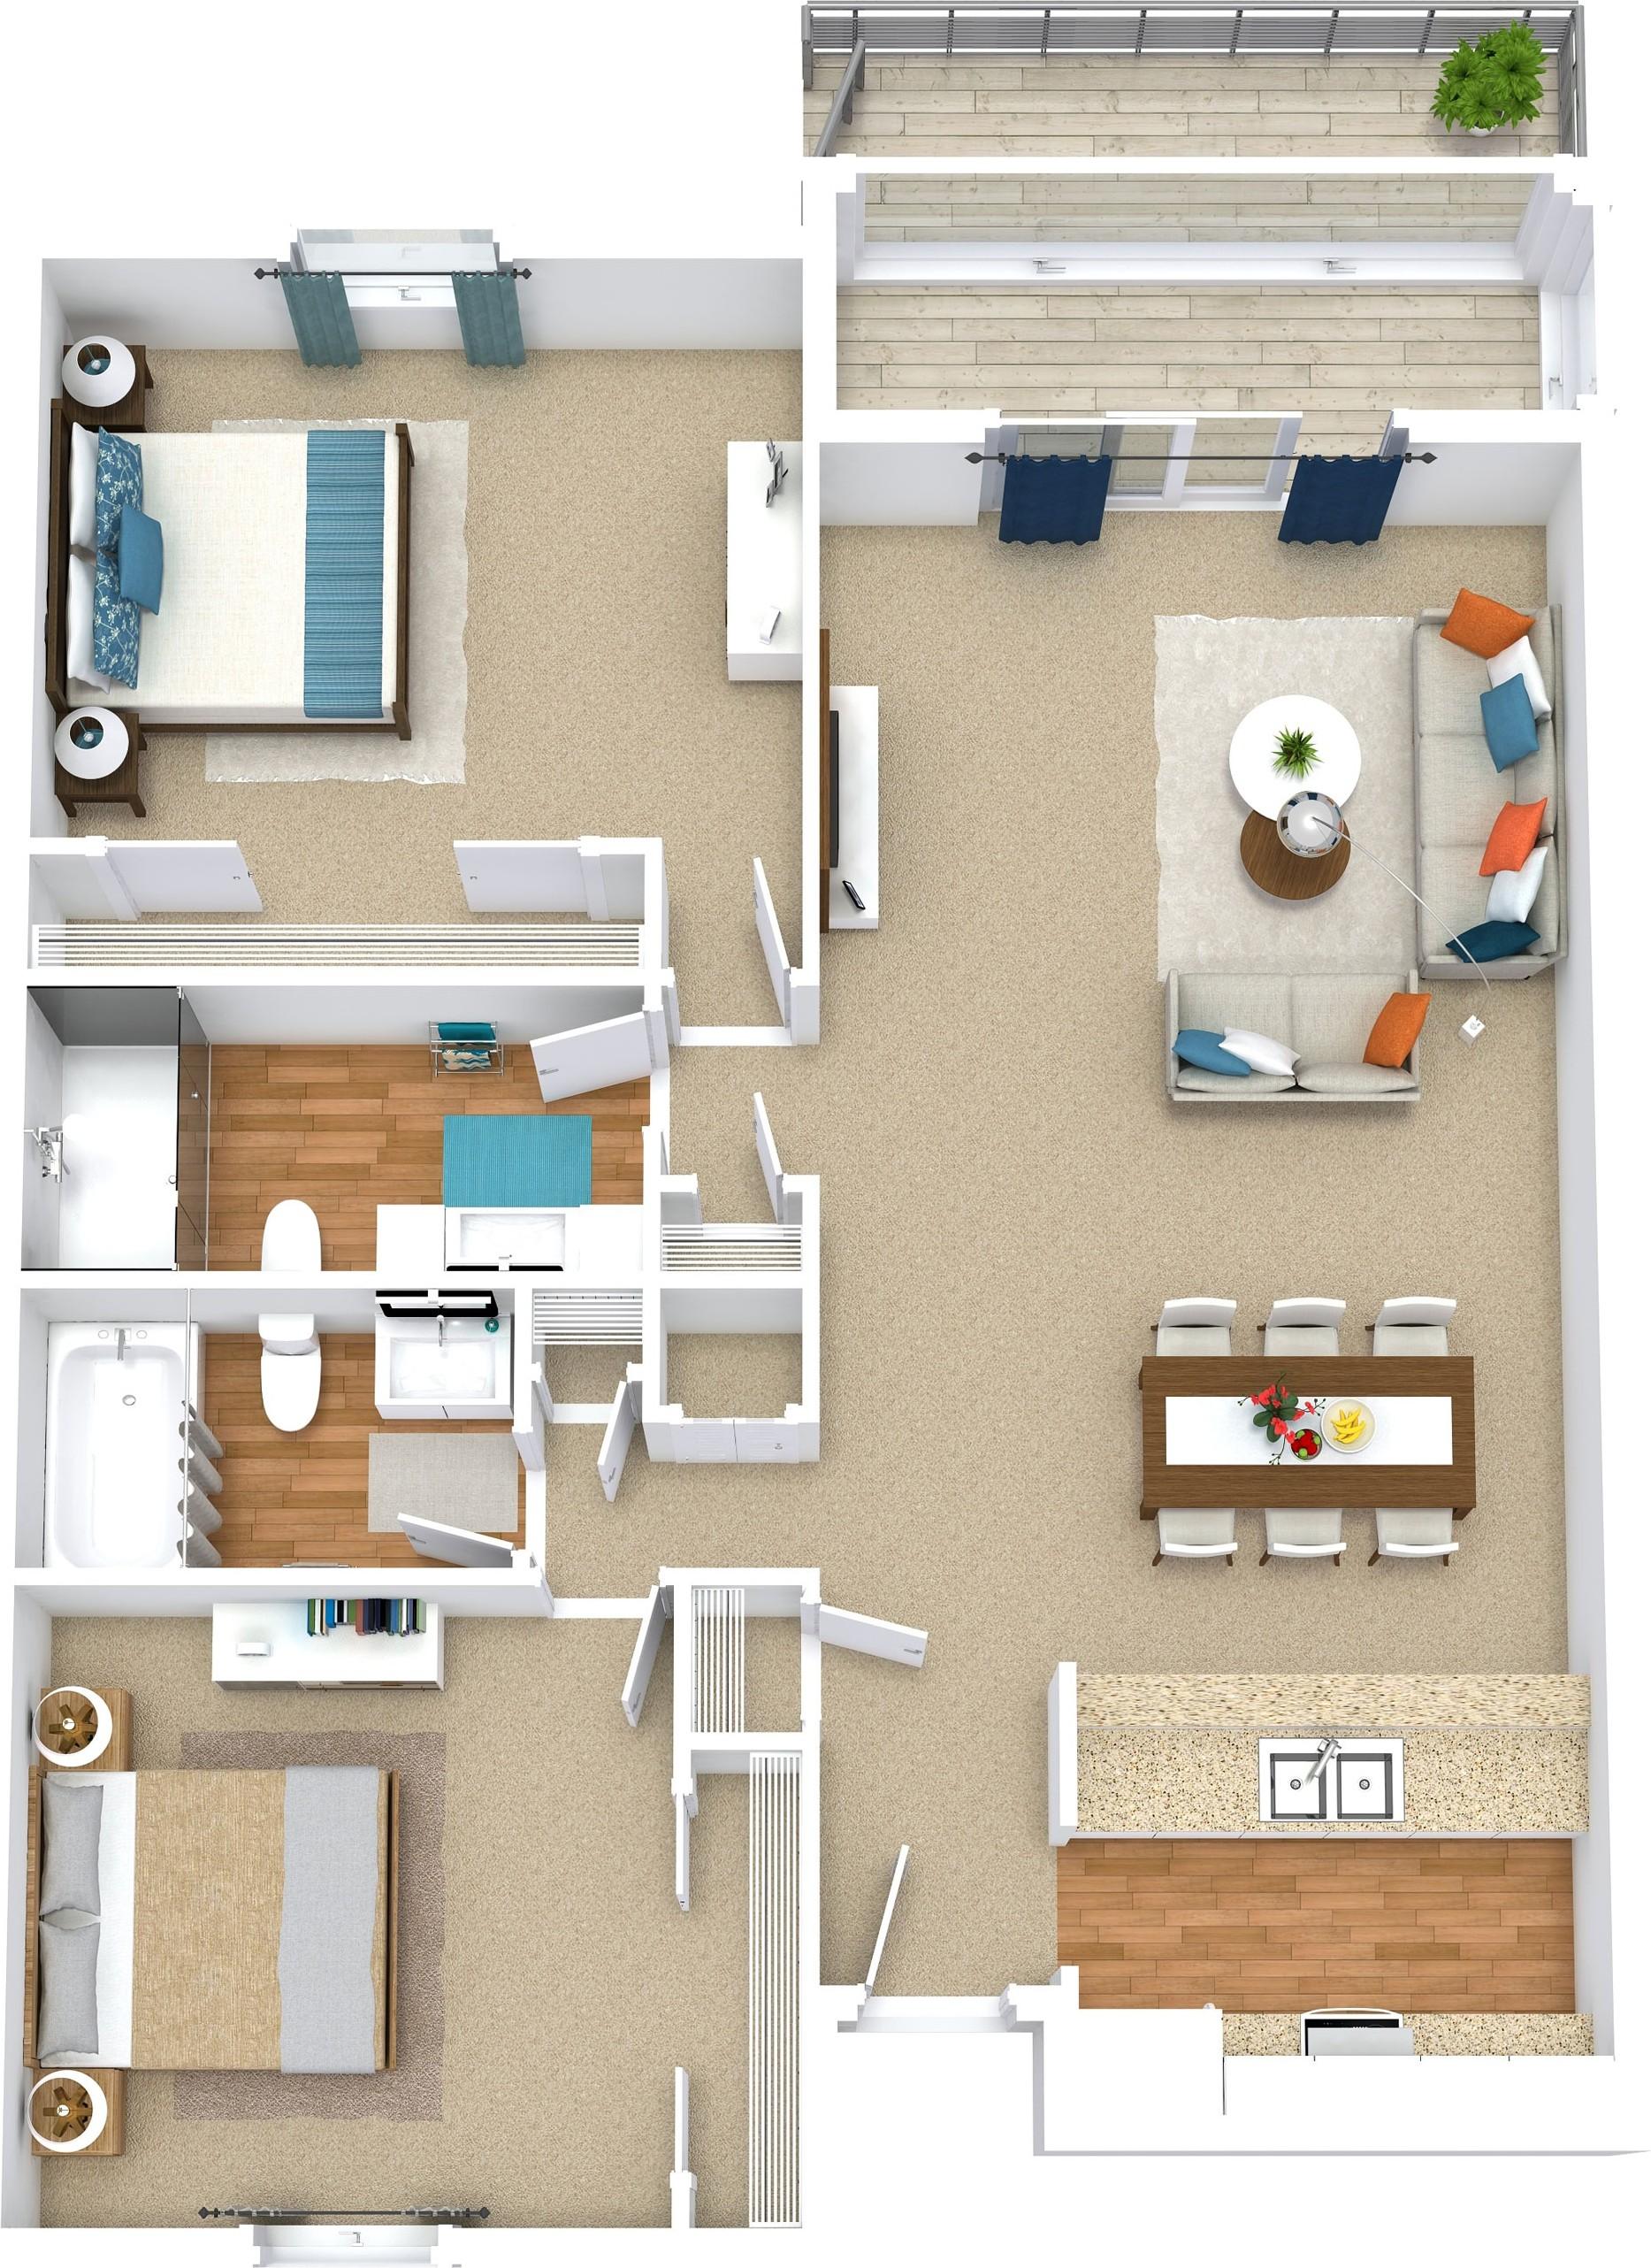 Tempe Vista Apartments